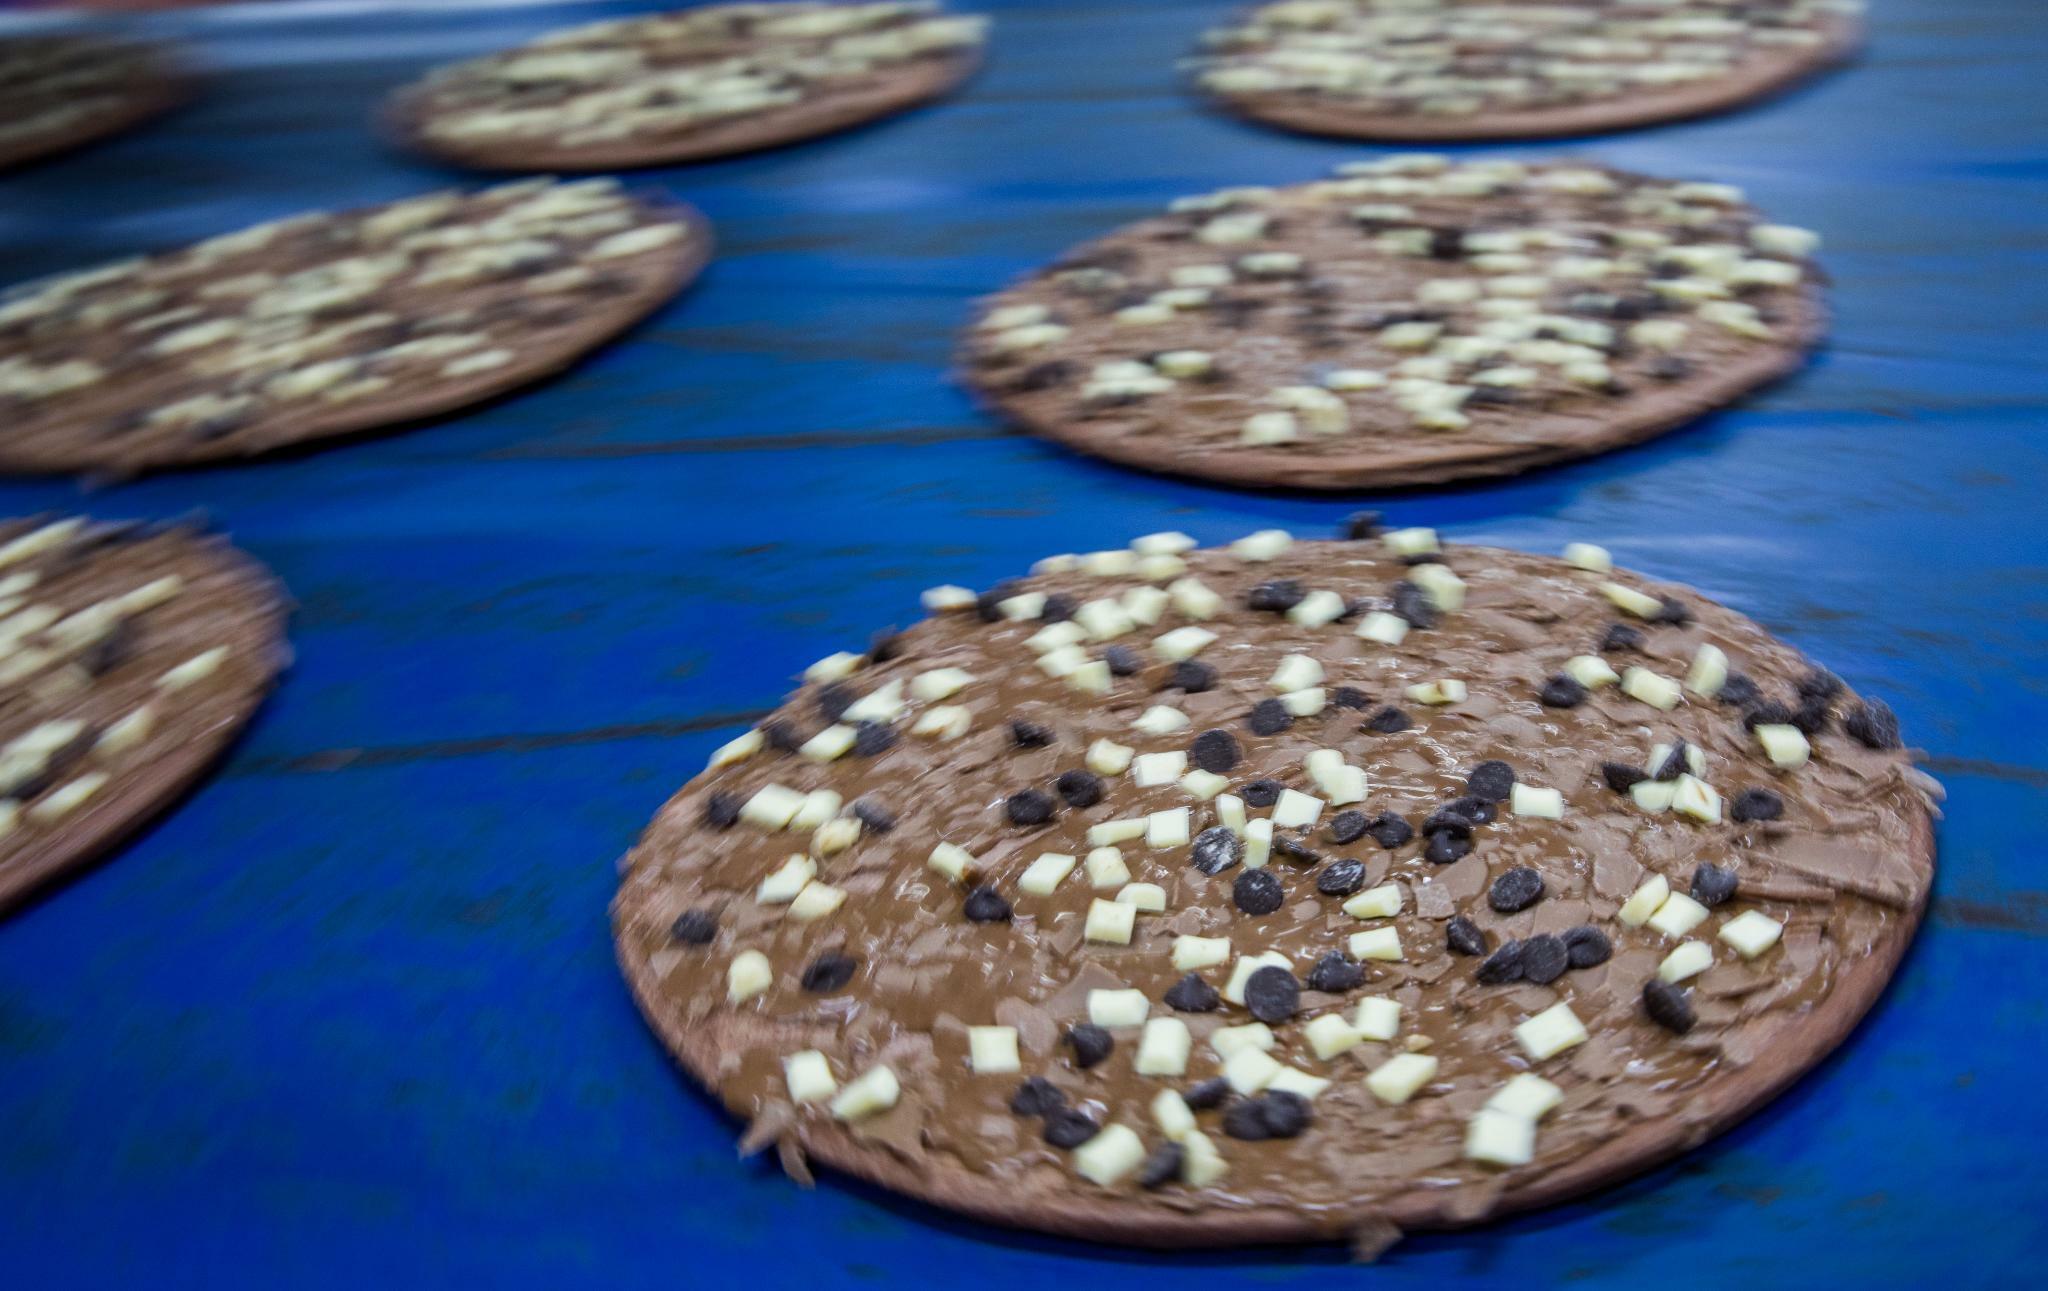 Lebensmittelhersteller: Dr. Oetker nimmt Schoko-Pizza aus dem Sortiment